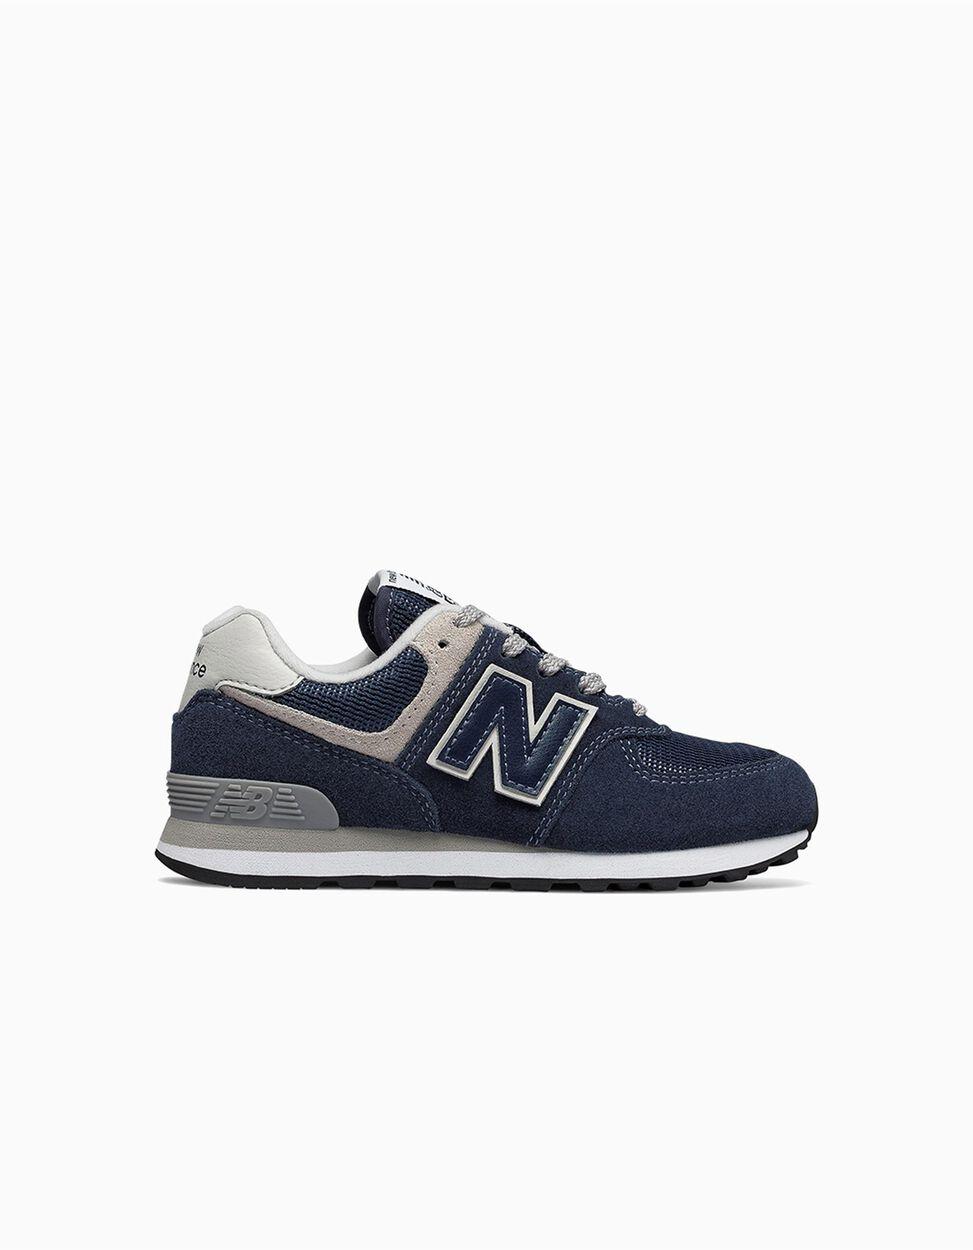 Eficiente Dispuesto Químico  Zapatillas New Balance 574 para Niño, Azul Oscuro NEW BALANCE | Zippy Online